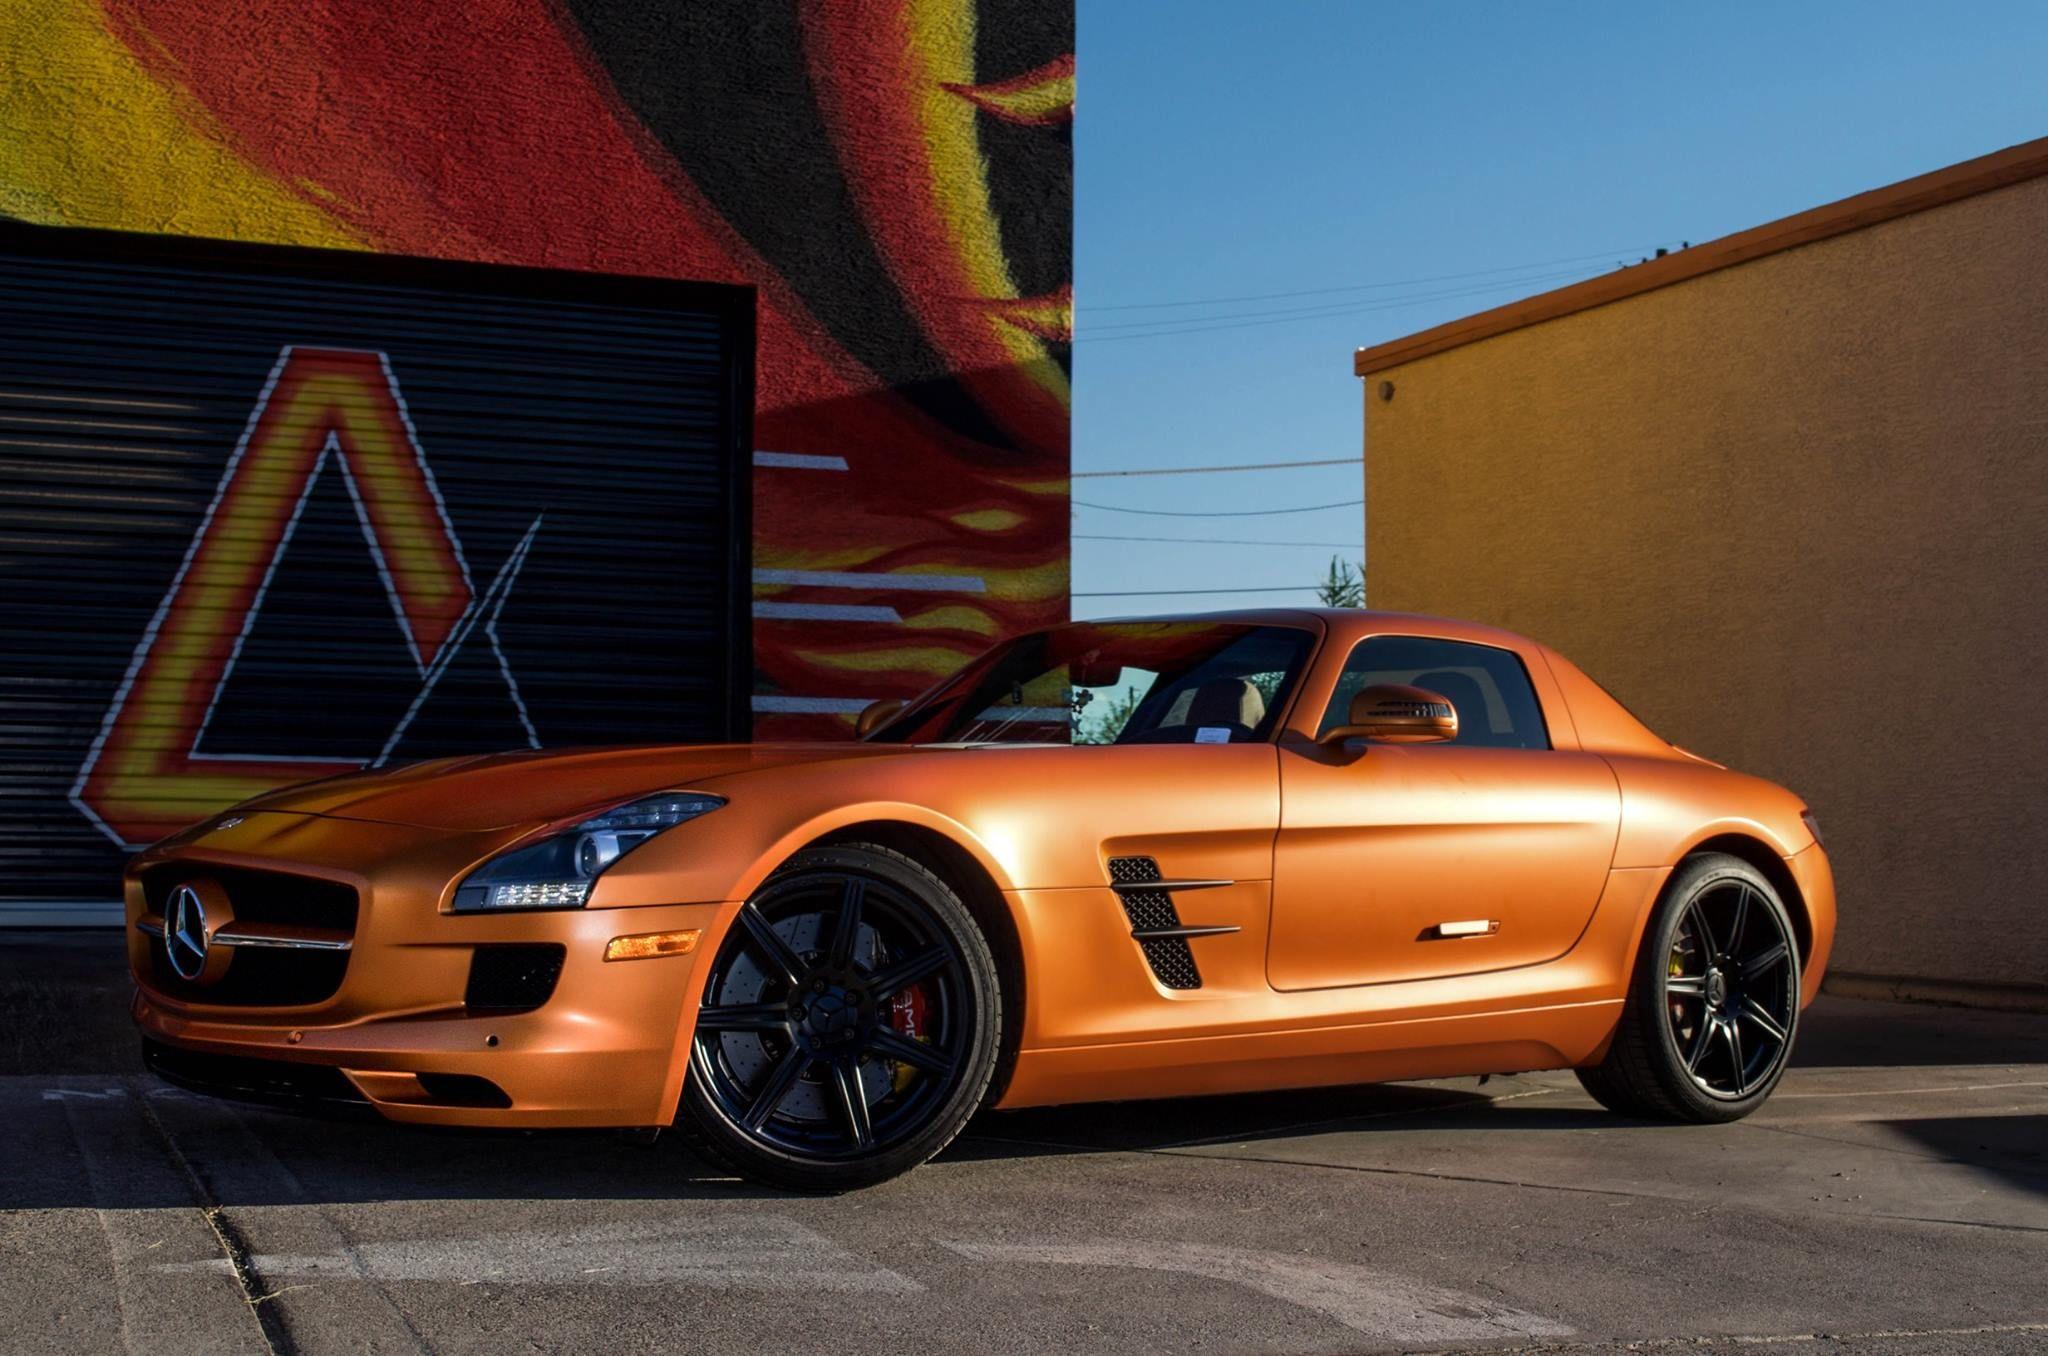 Mercedes SLS AMG 3M Satin Canyon Copper Orange Matte Black Vents ...